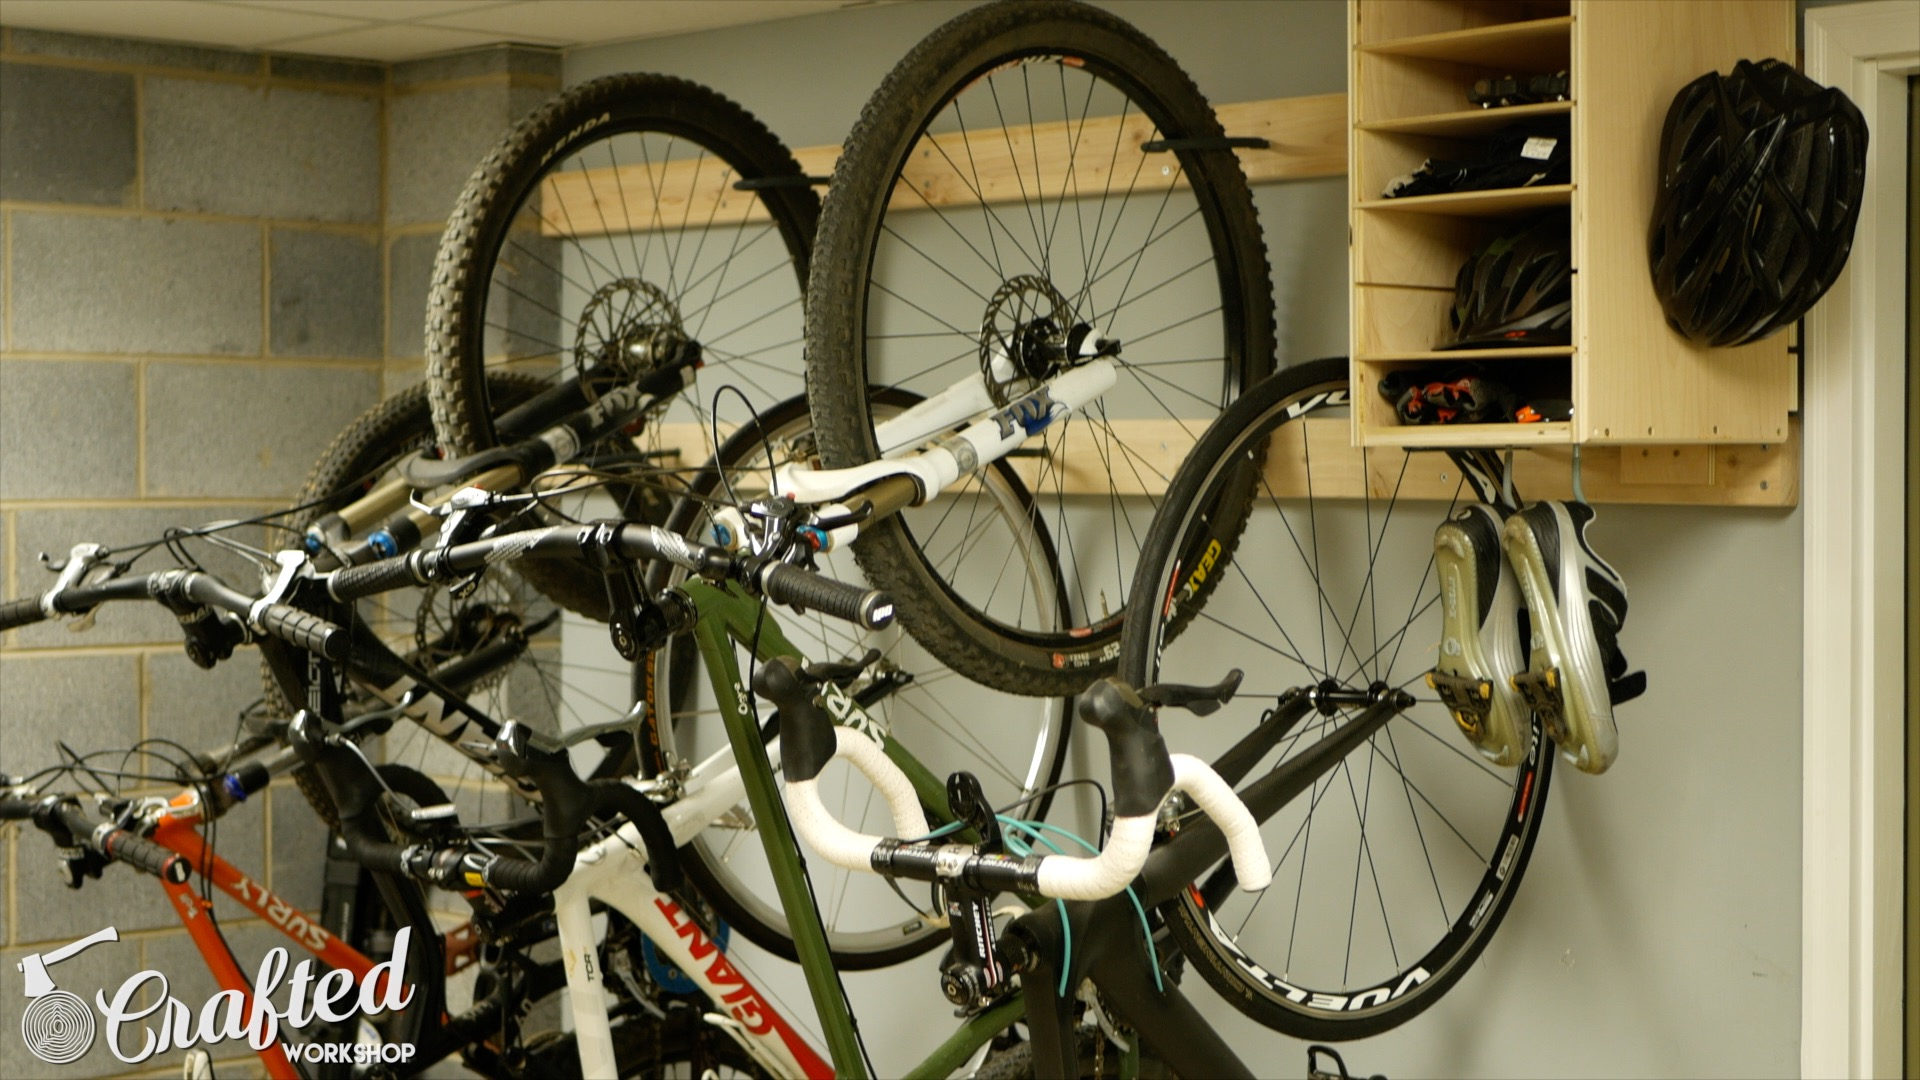 Diy Bike Rack For 20 Bike Storage Stand Cabinet For